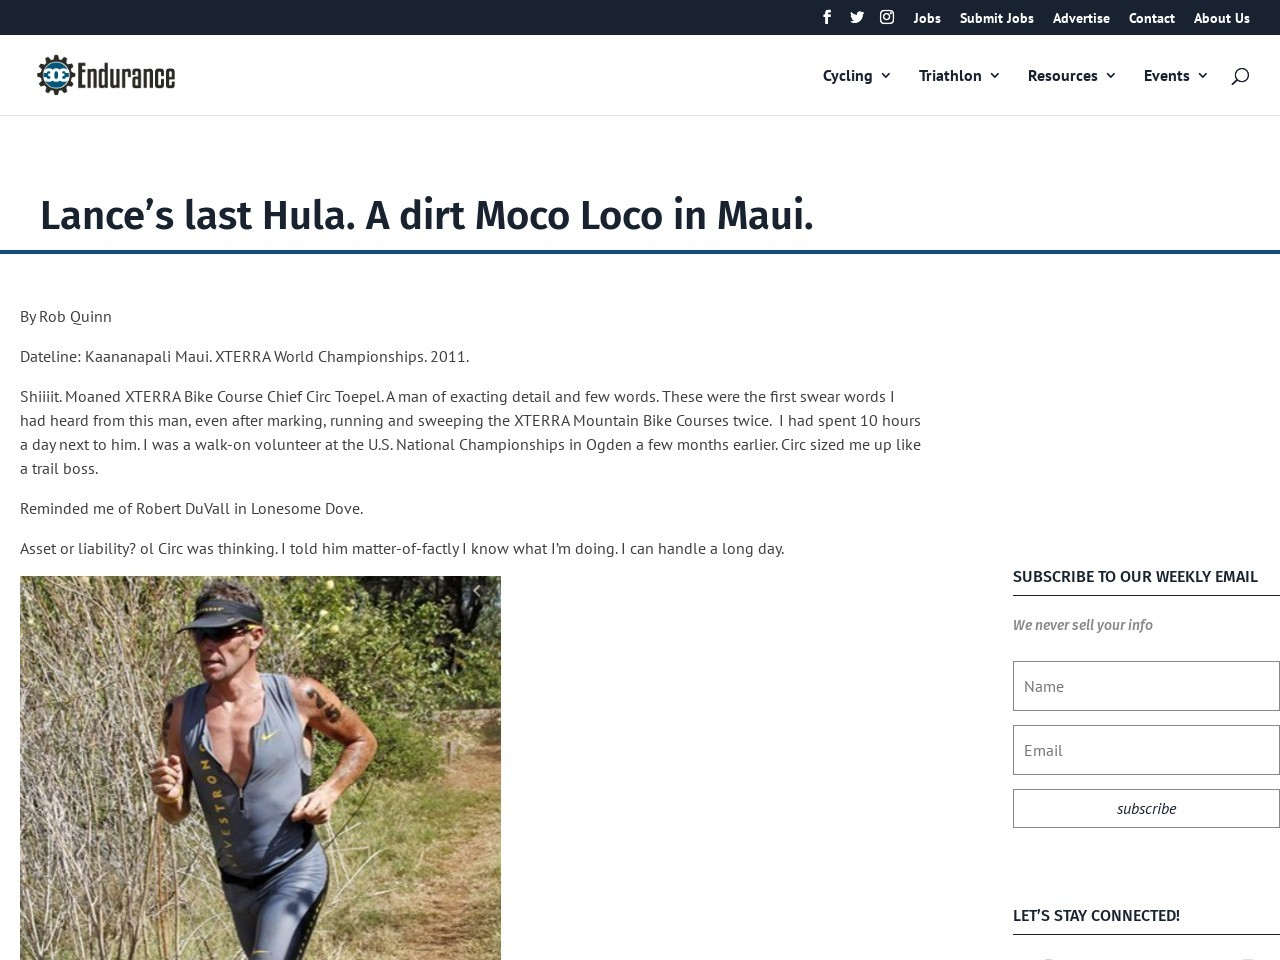 Lance's last Hula. A dirt Moco Loco in Maui.